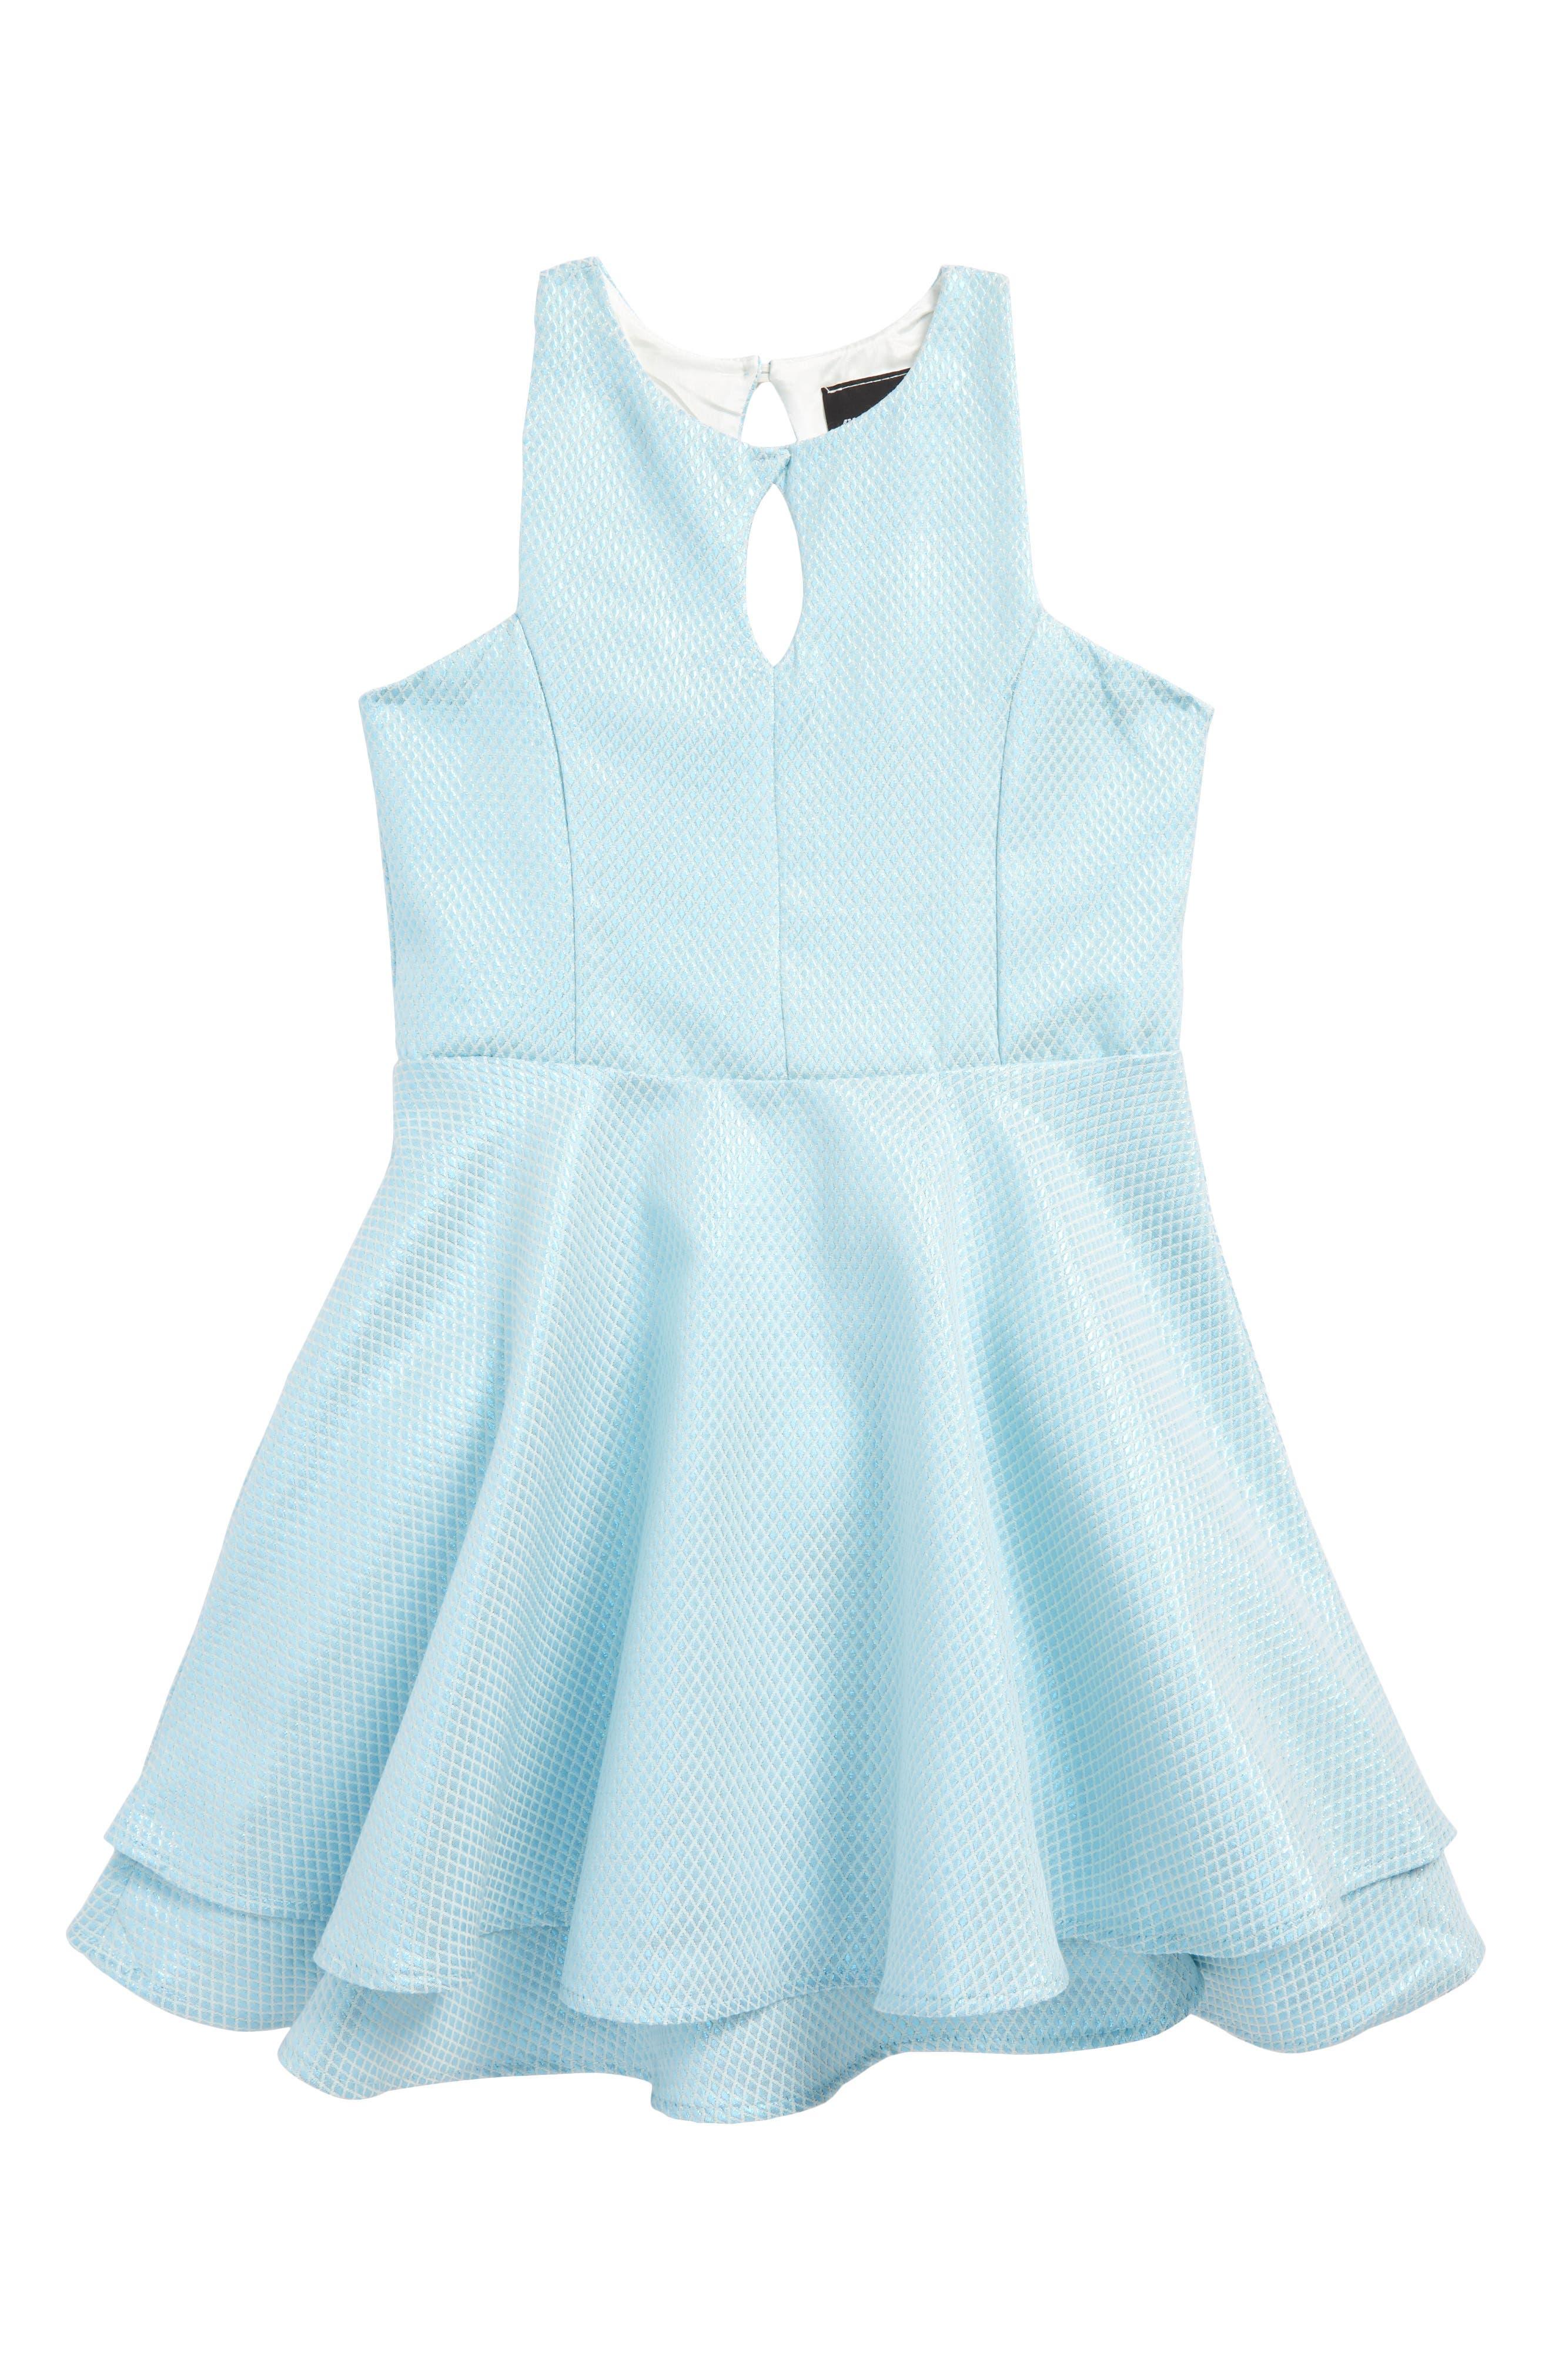 Sleeveless Party Dress,                             Main thumbnail 1, color,                             400